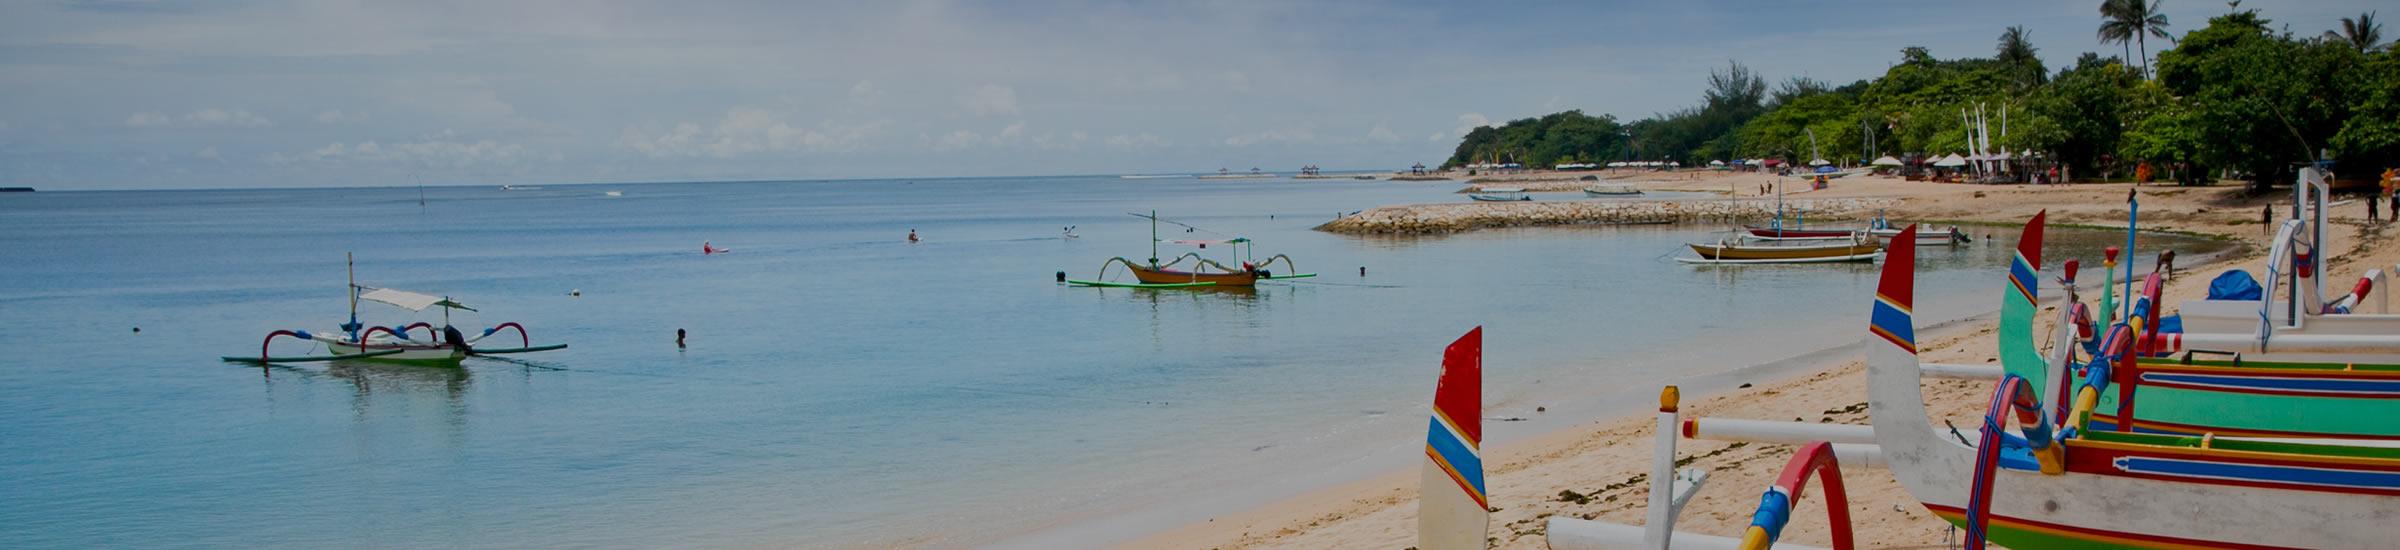 Cheap Rental Cars Fiji Islands